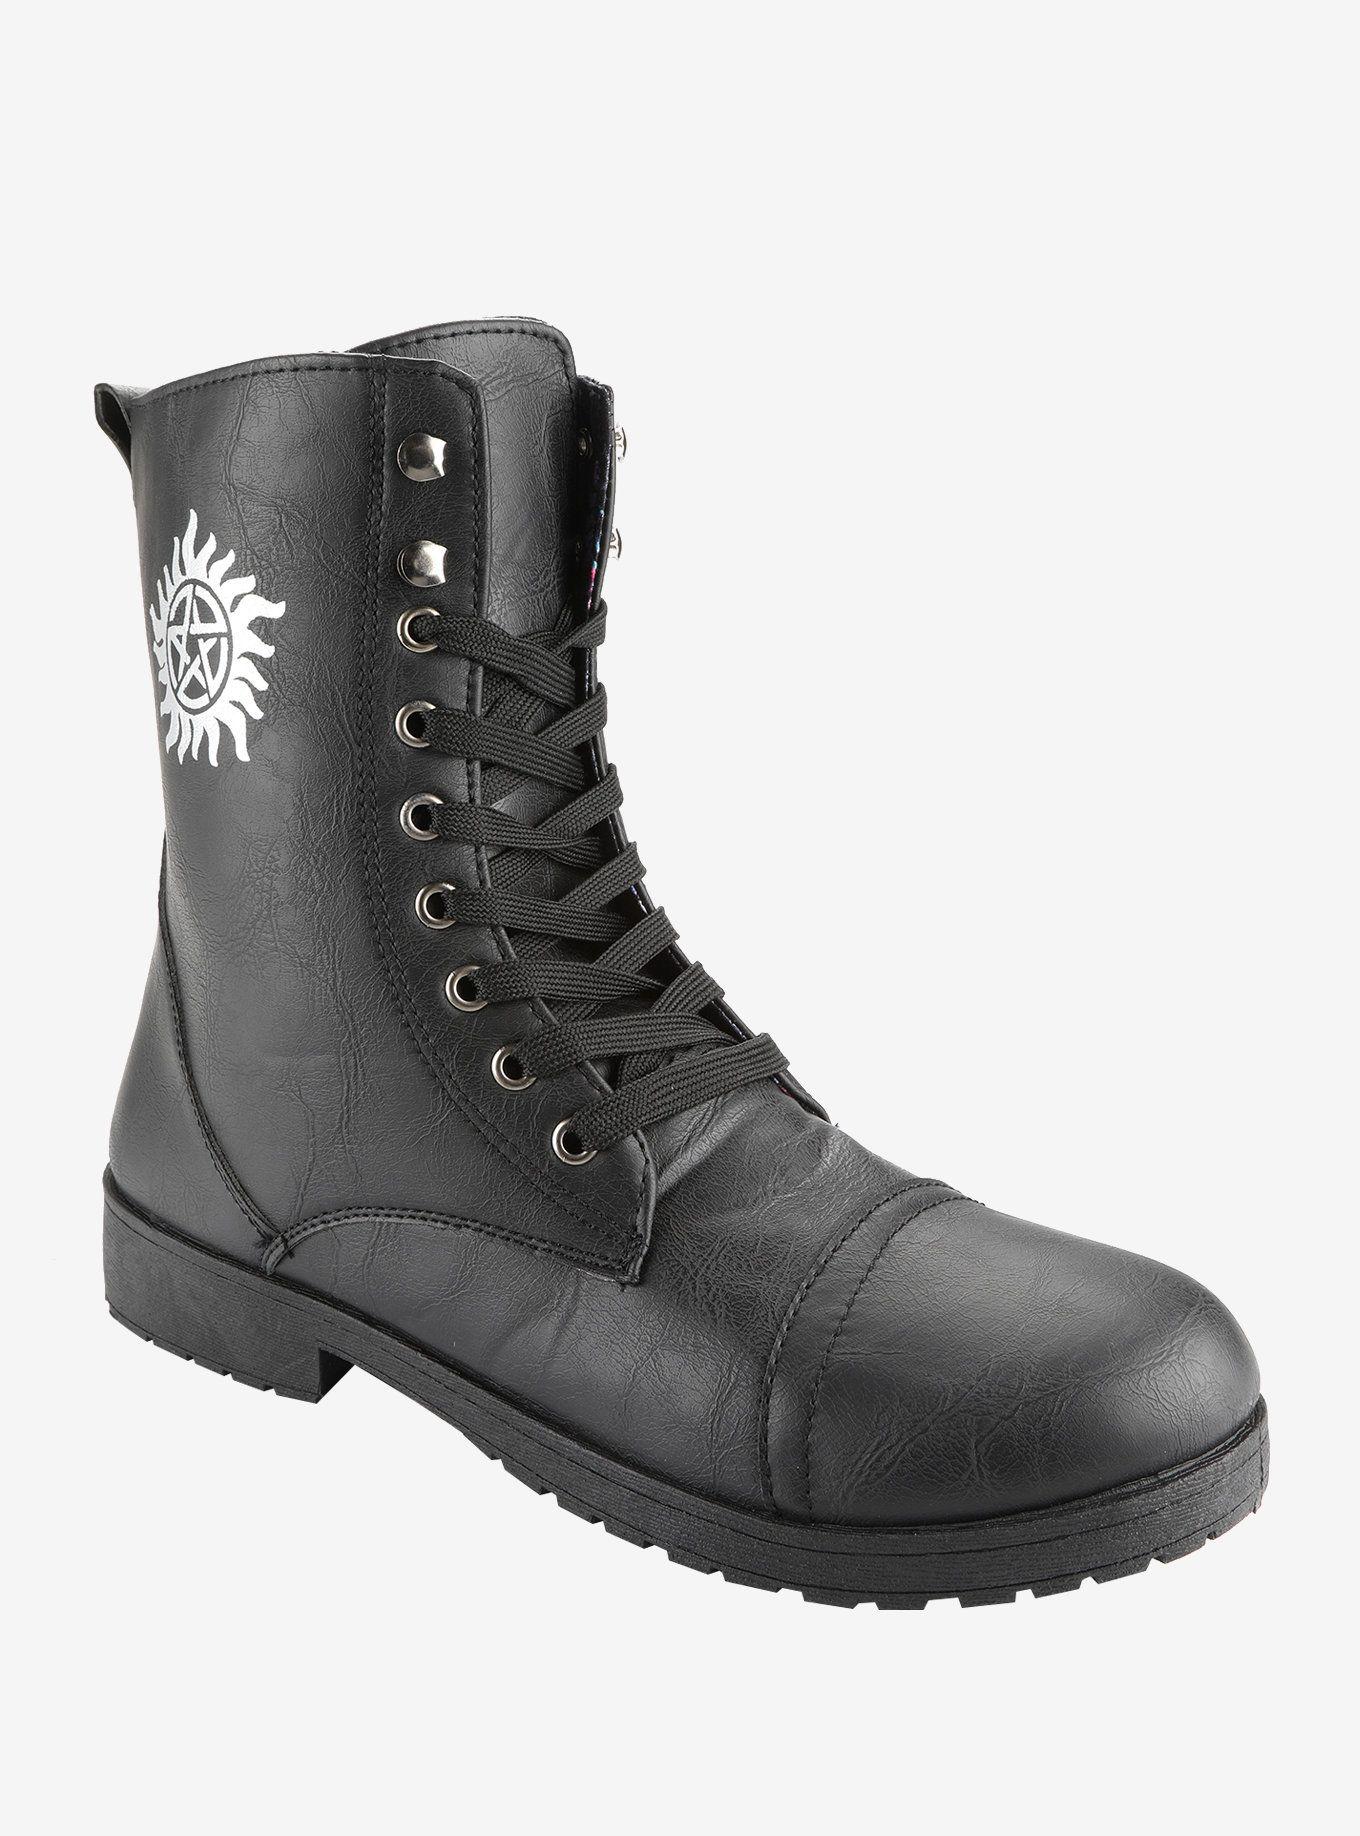 Supernatural AntiPossession Symbol Combat Boots Combat